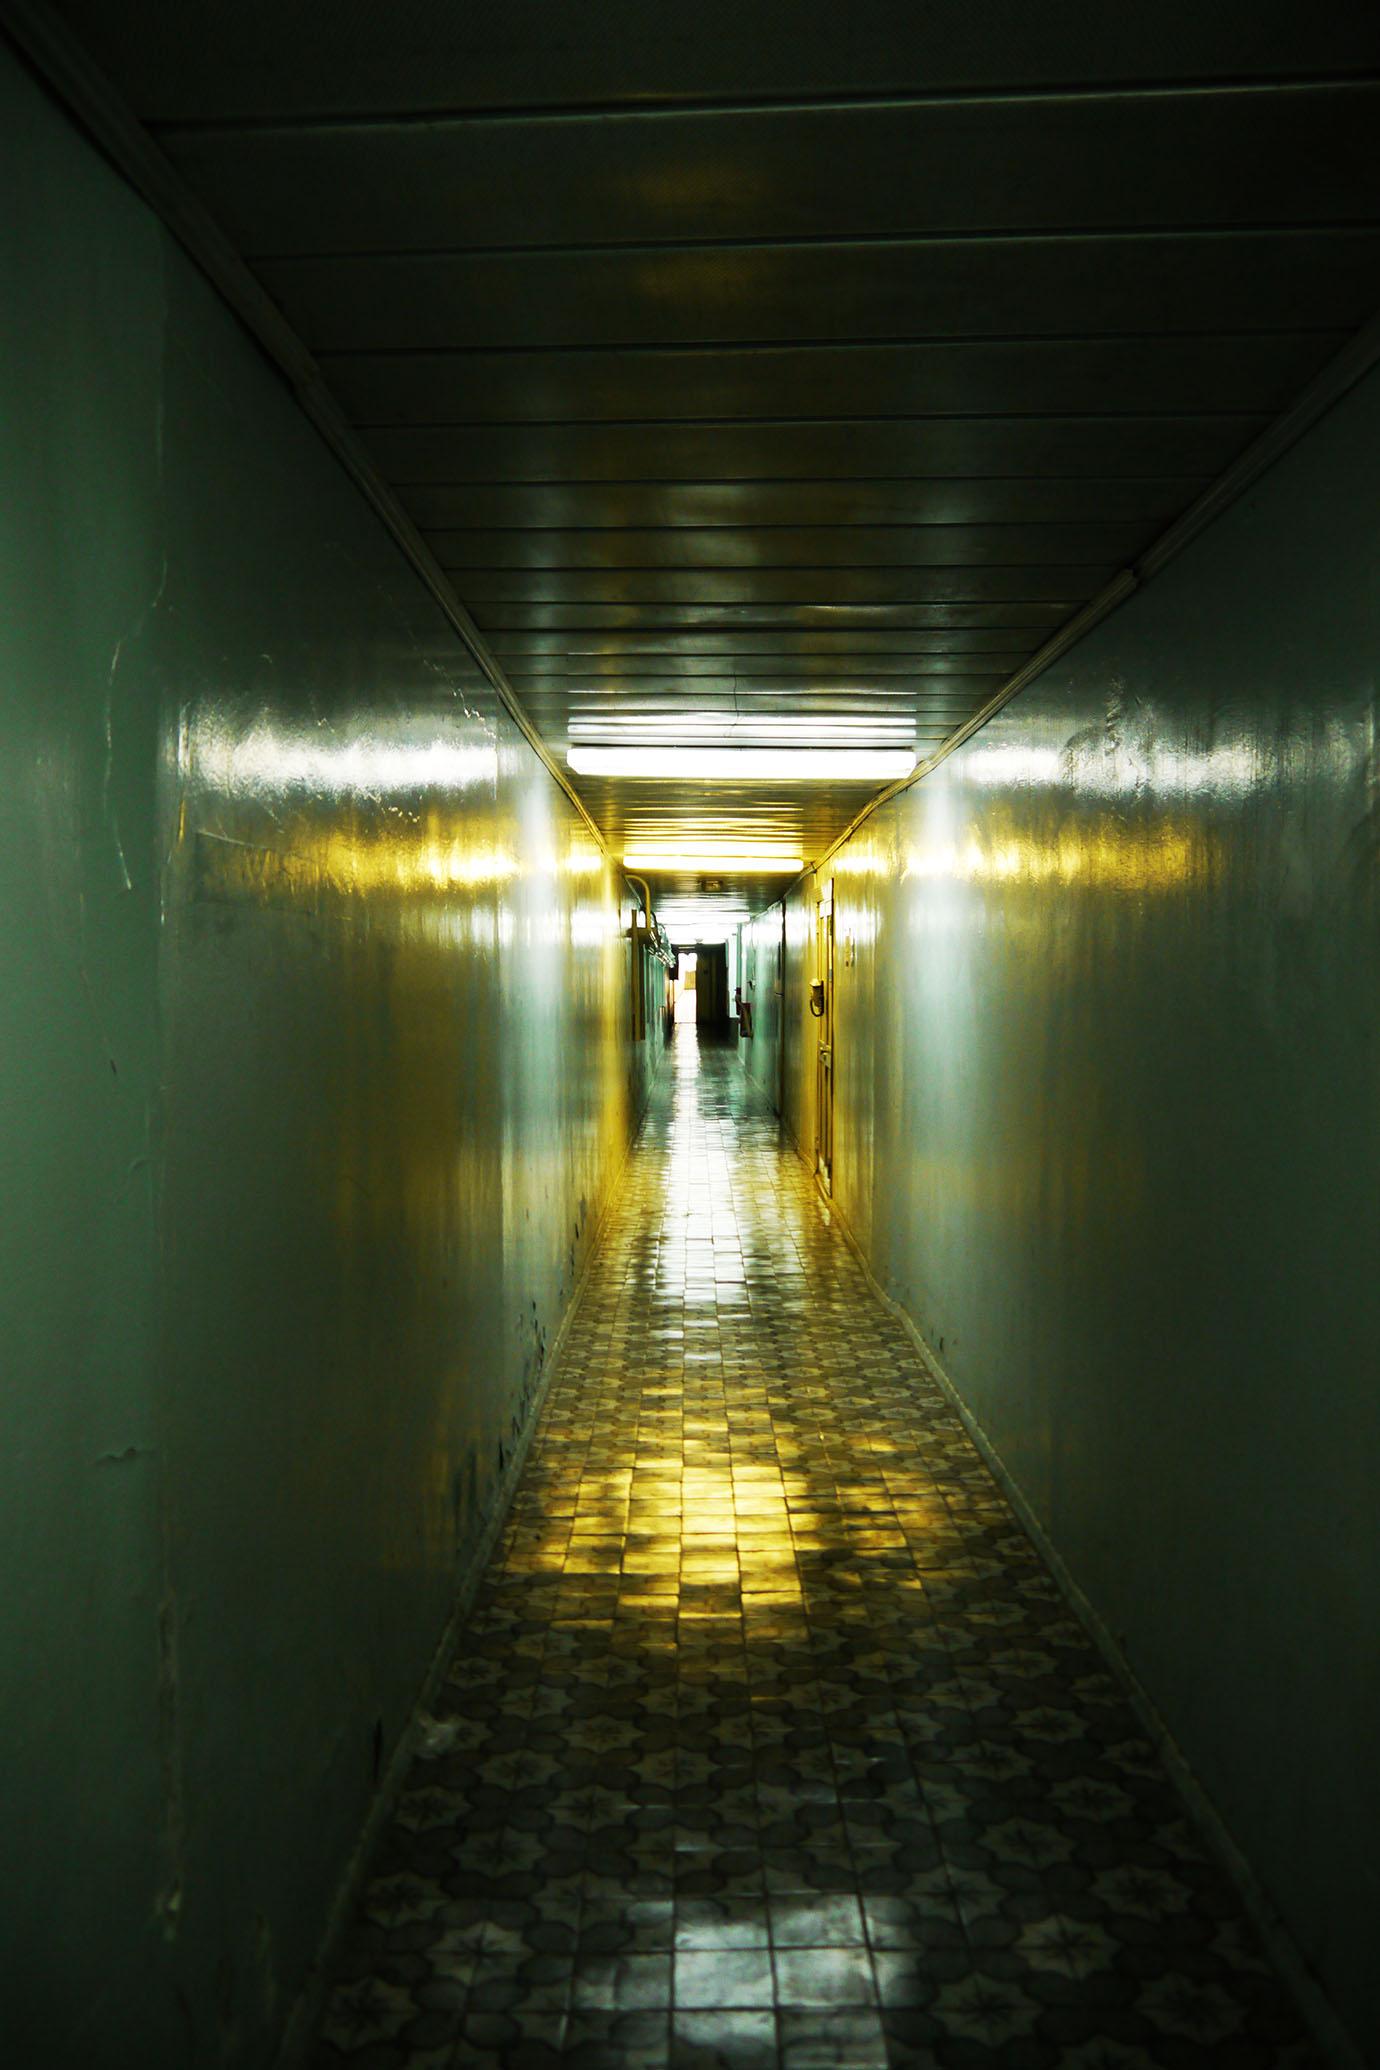 chernobyl-disaster8